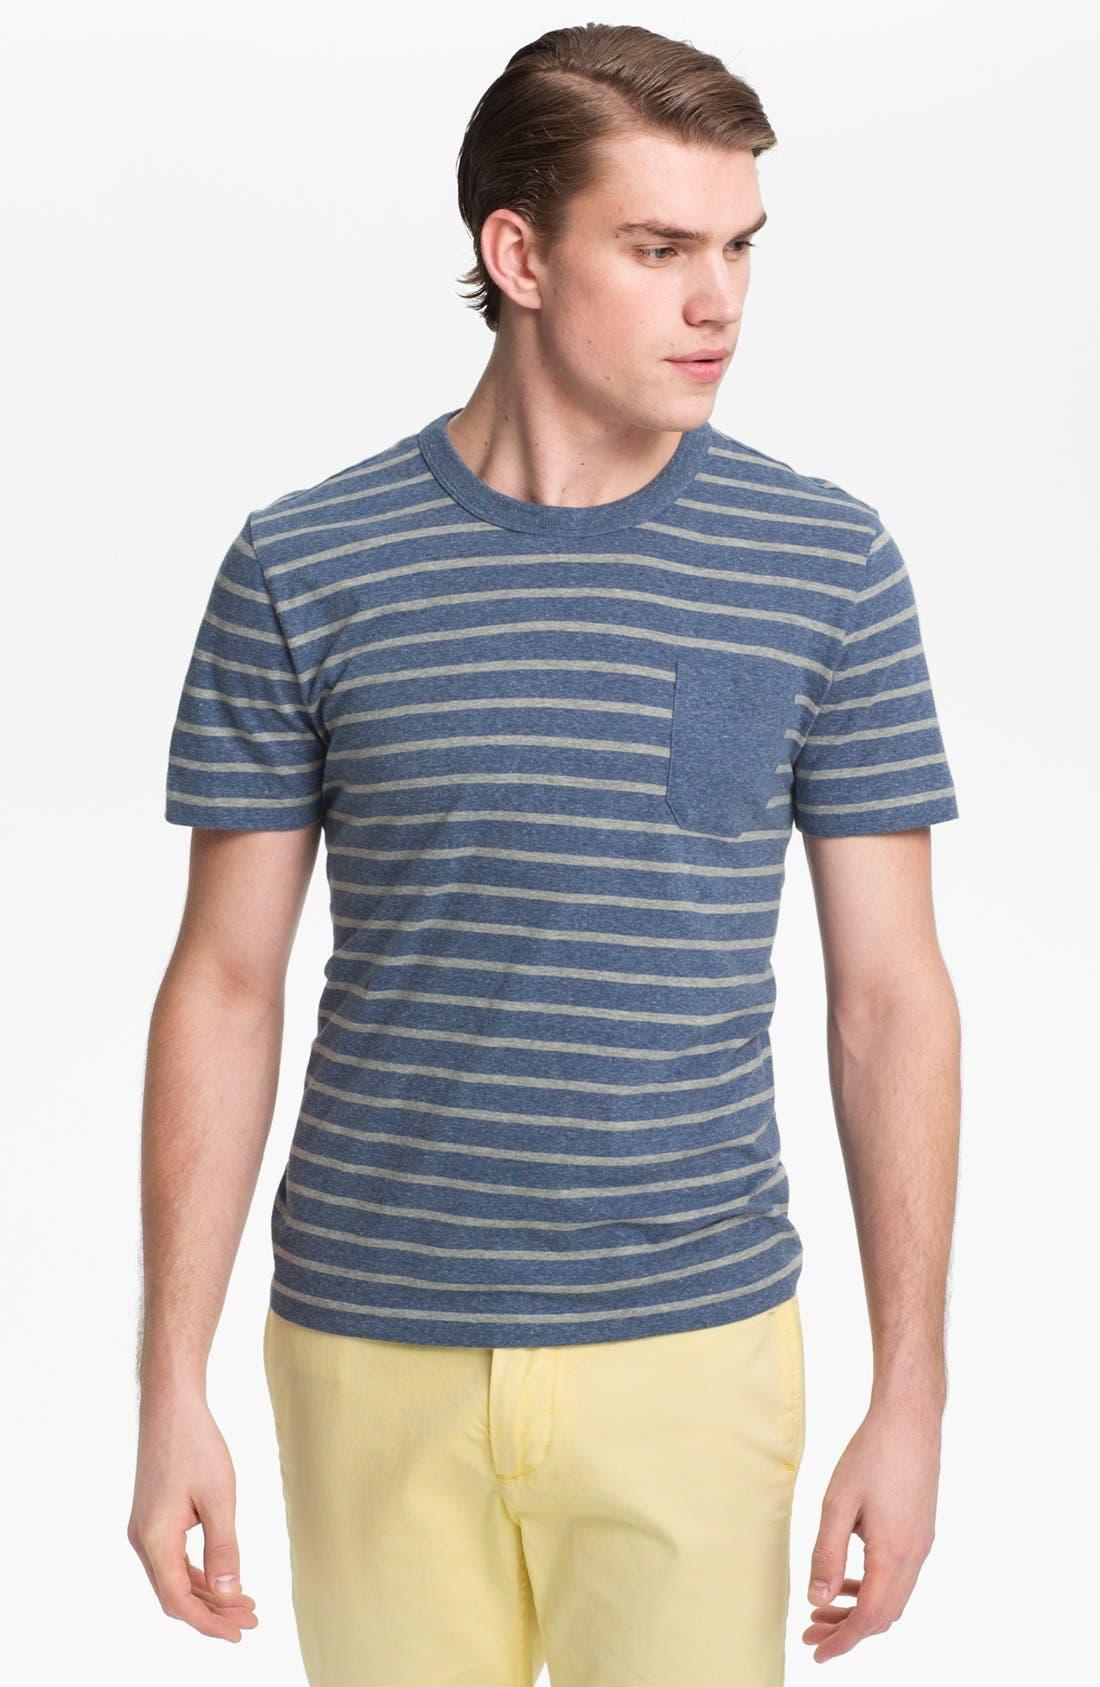 Alternate Image 1 Selected - Jack Spade 'Calvin' Stripe Pocket T-Shirt